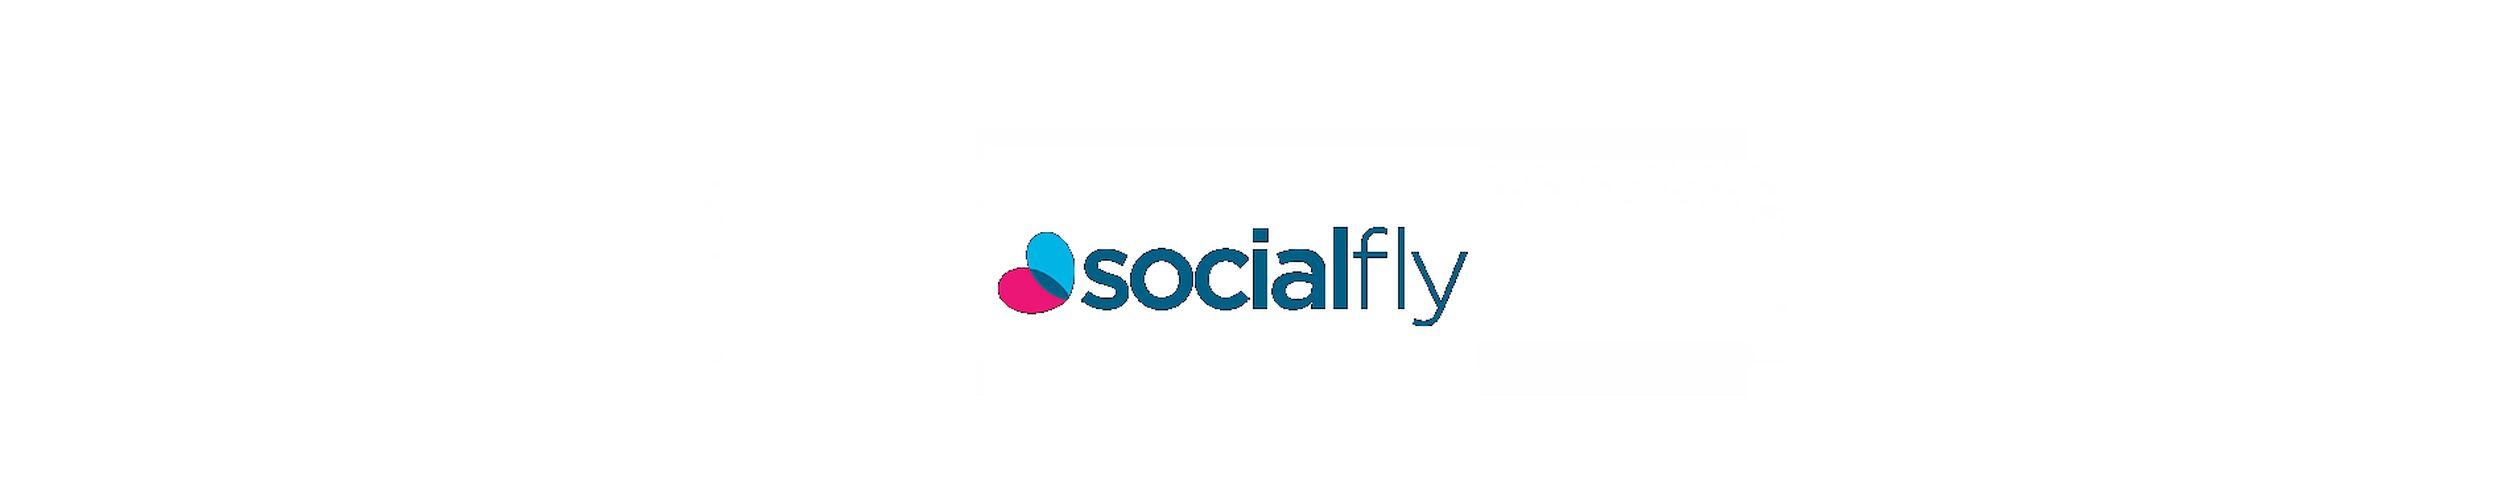 socialfly-logo